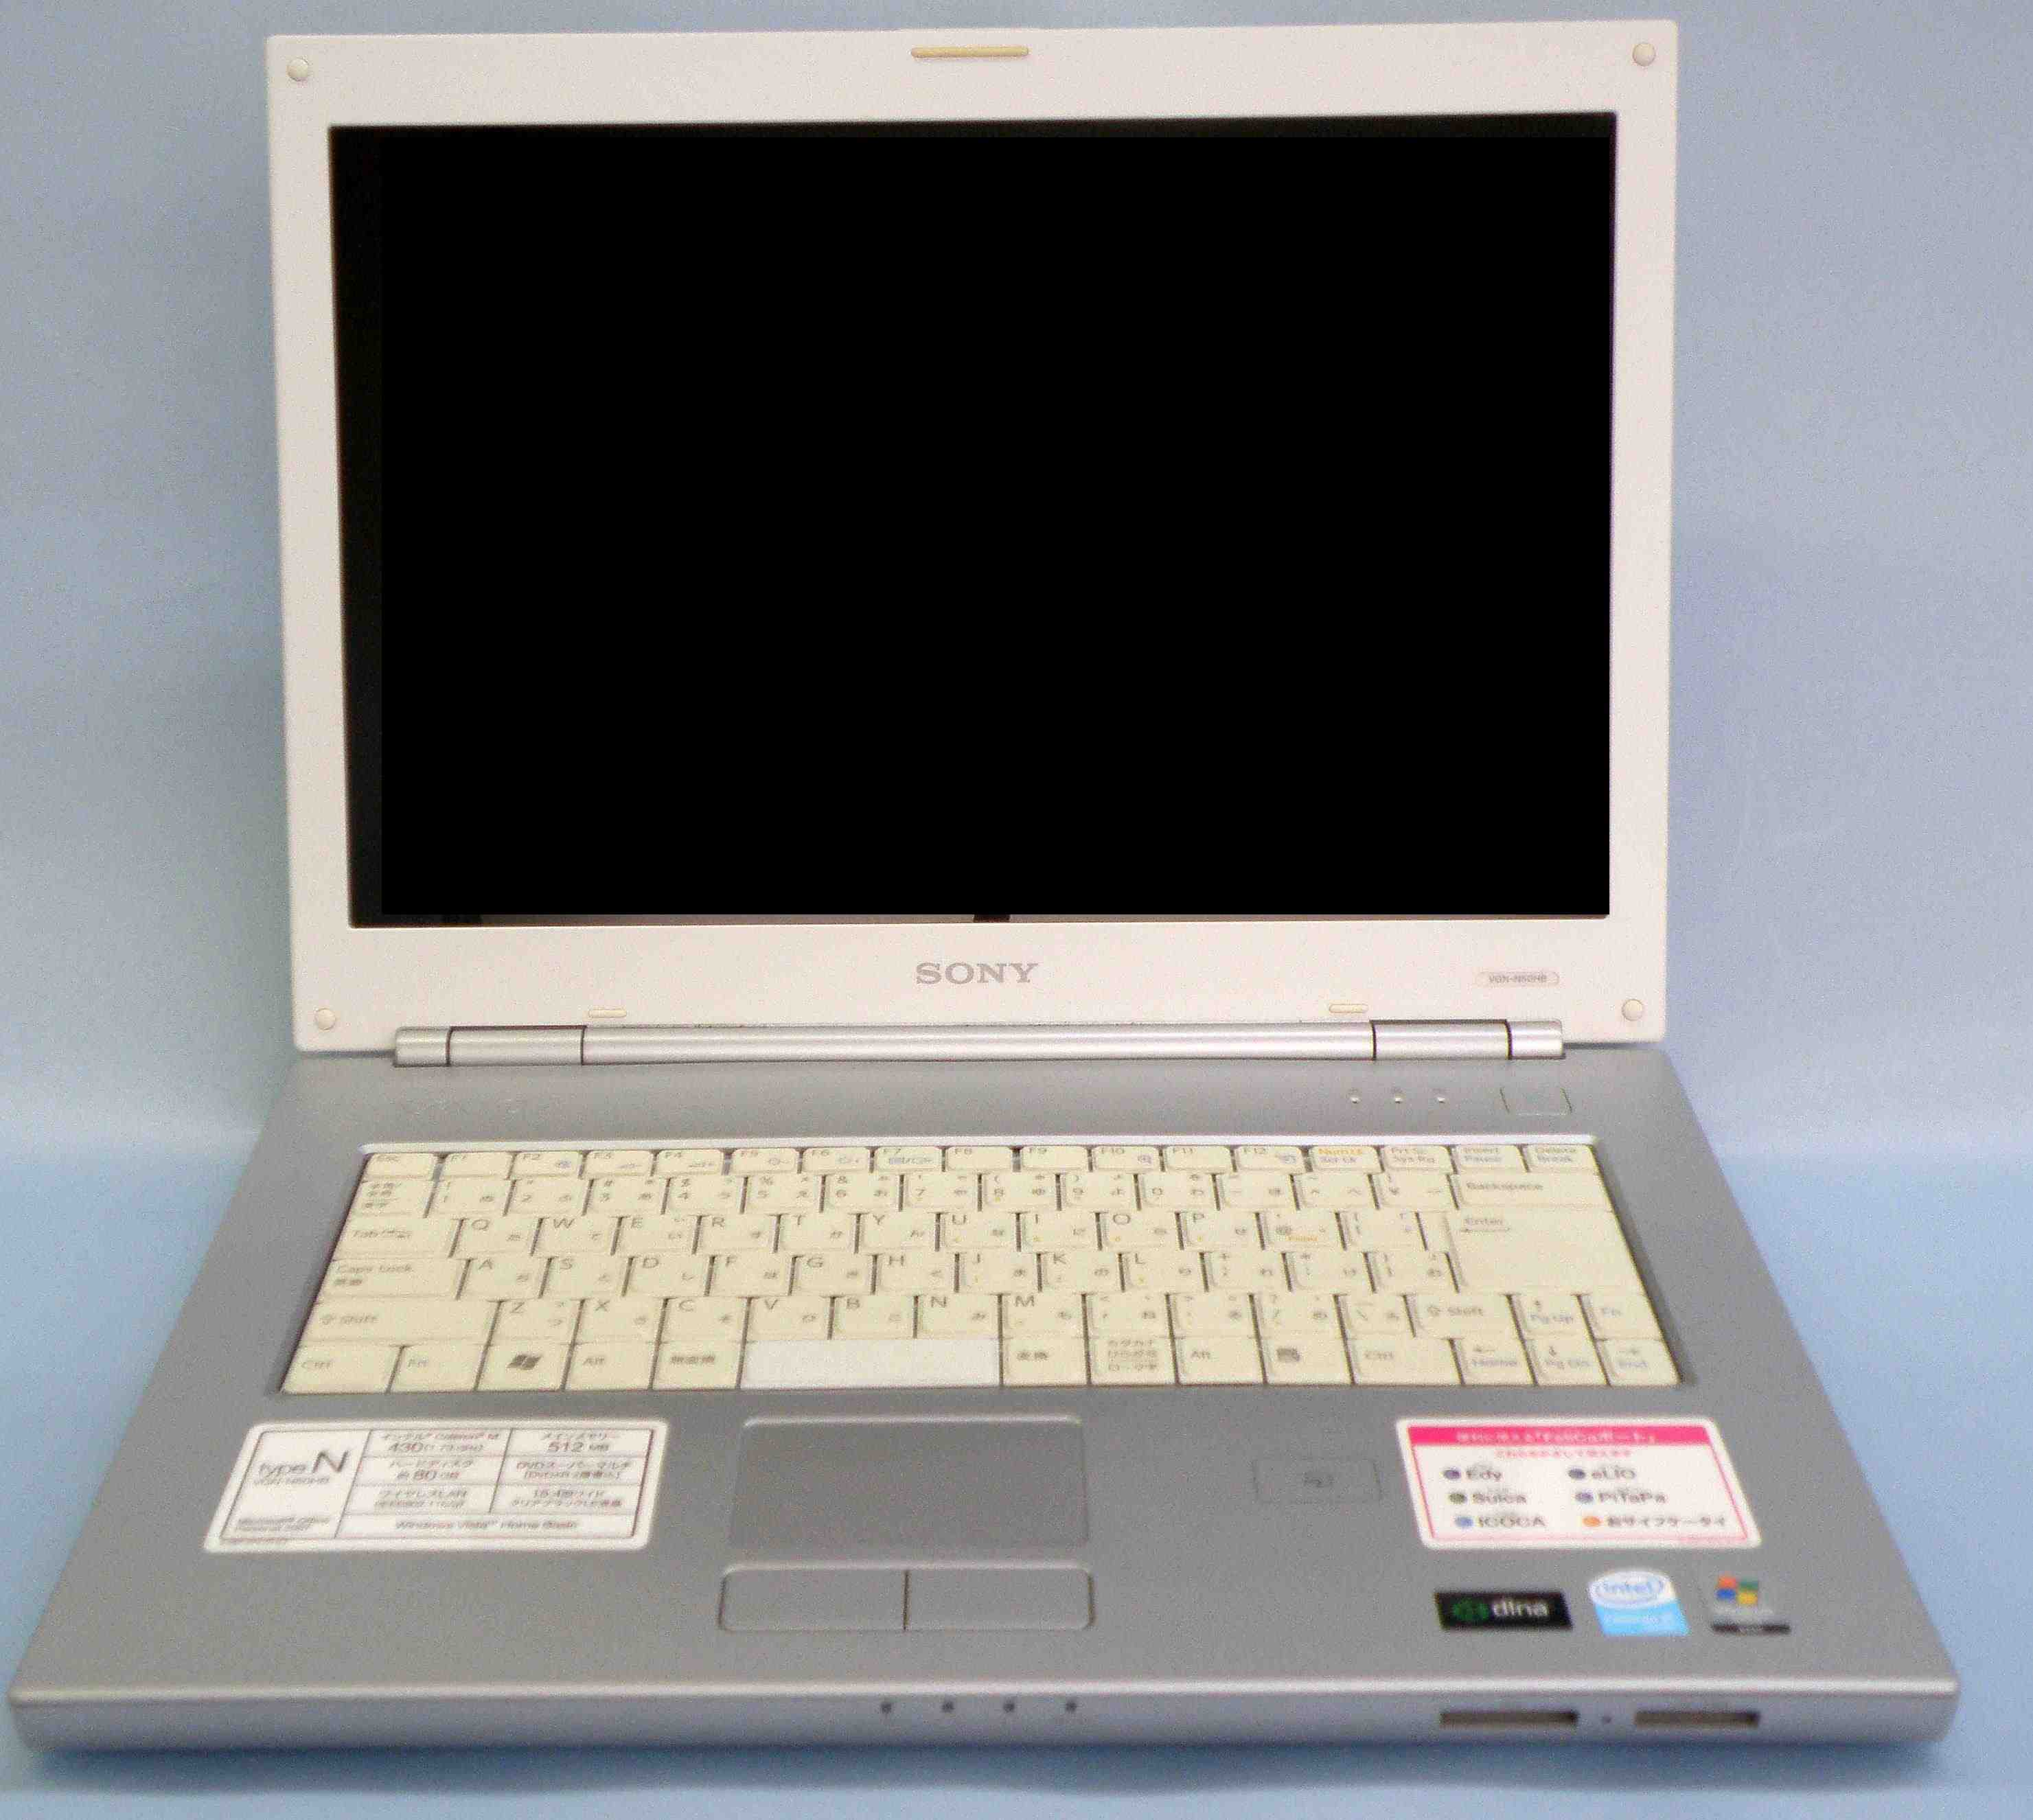 SONY ノートパソコン VAIO VGN-N50HB